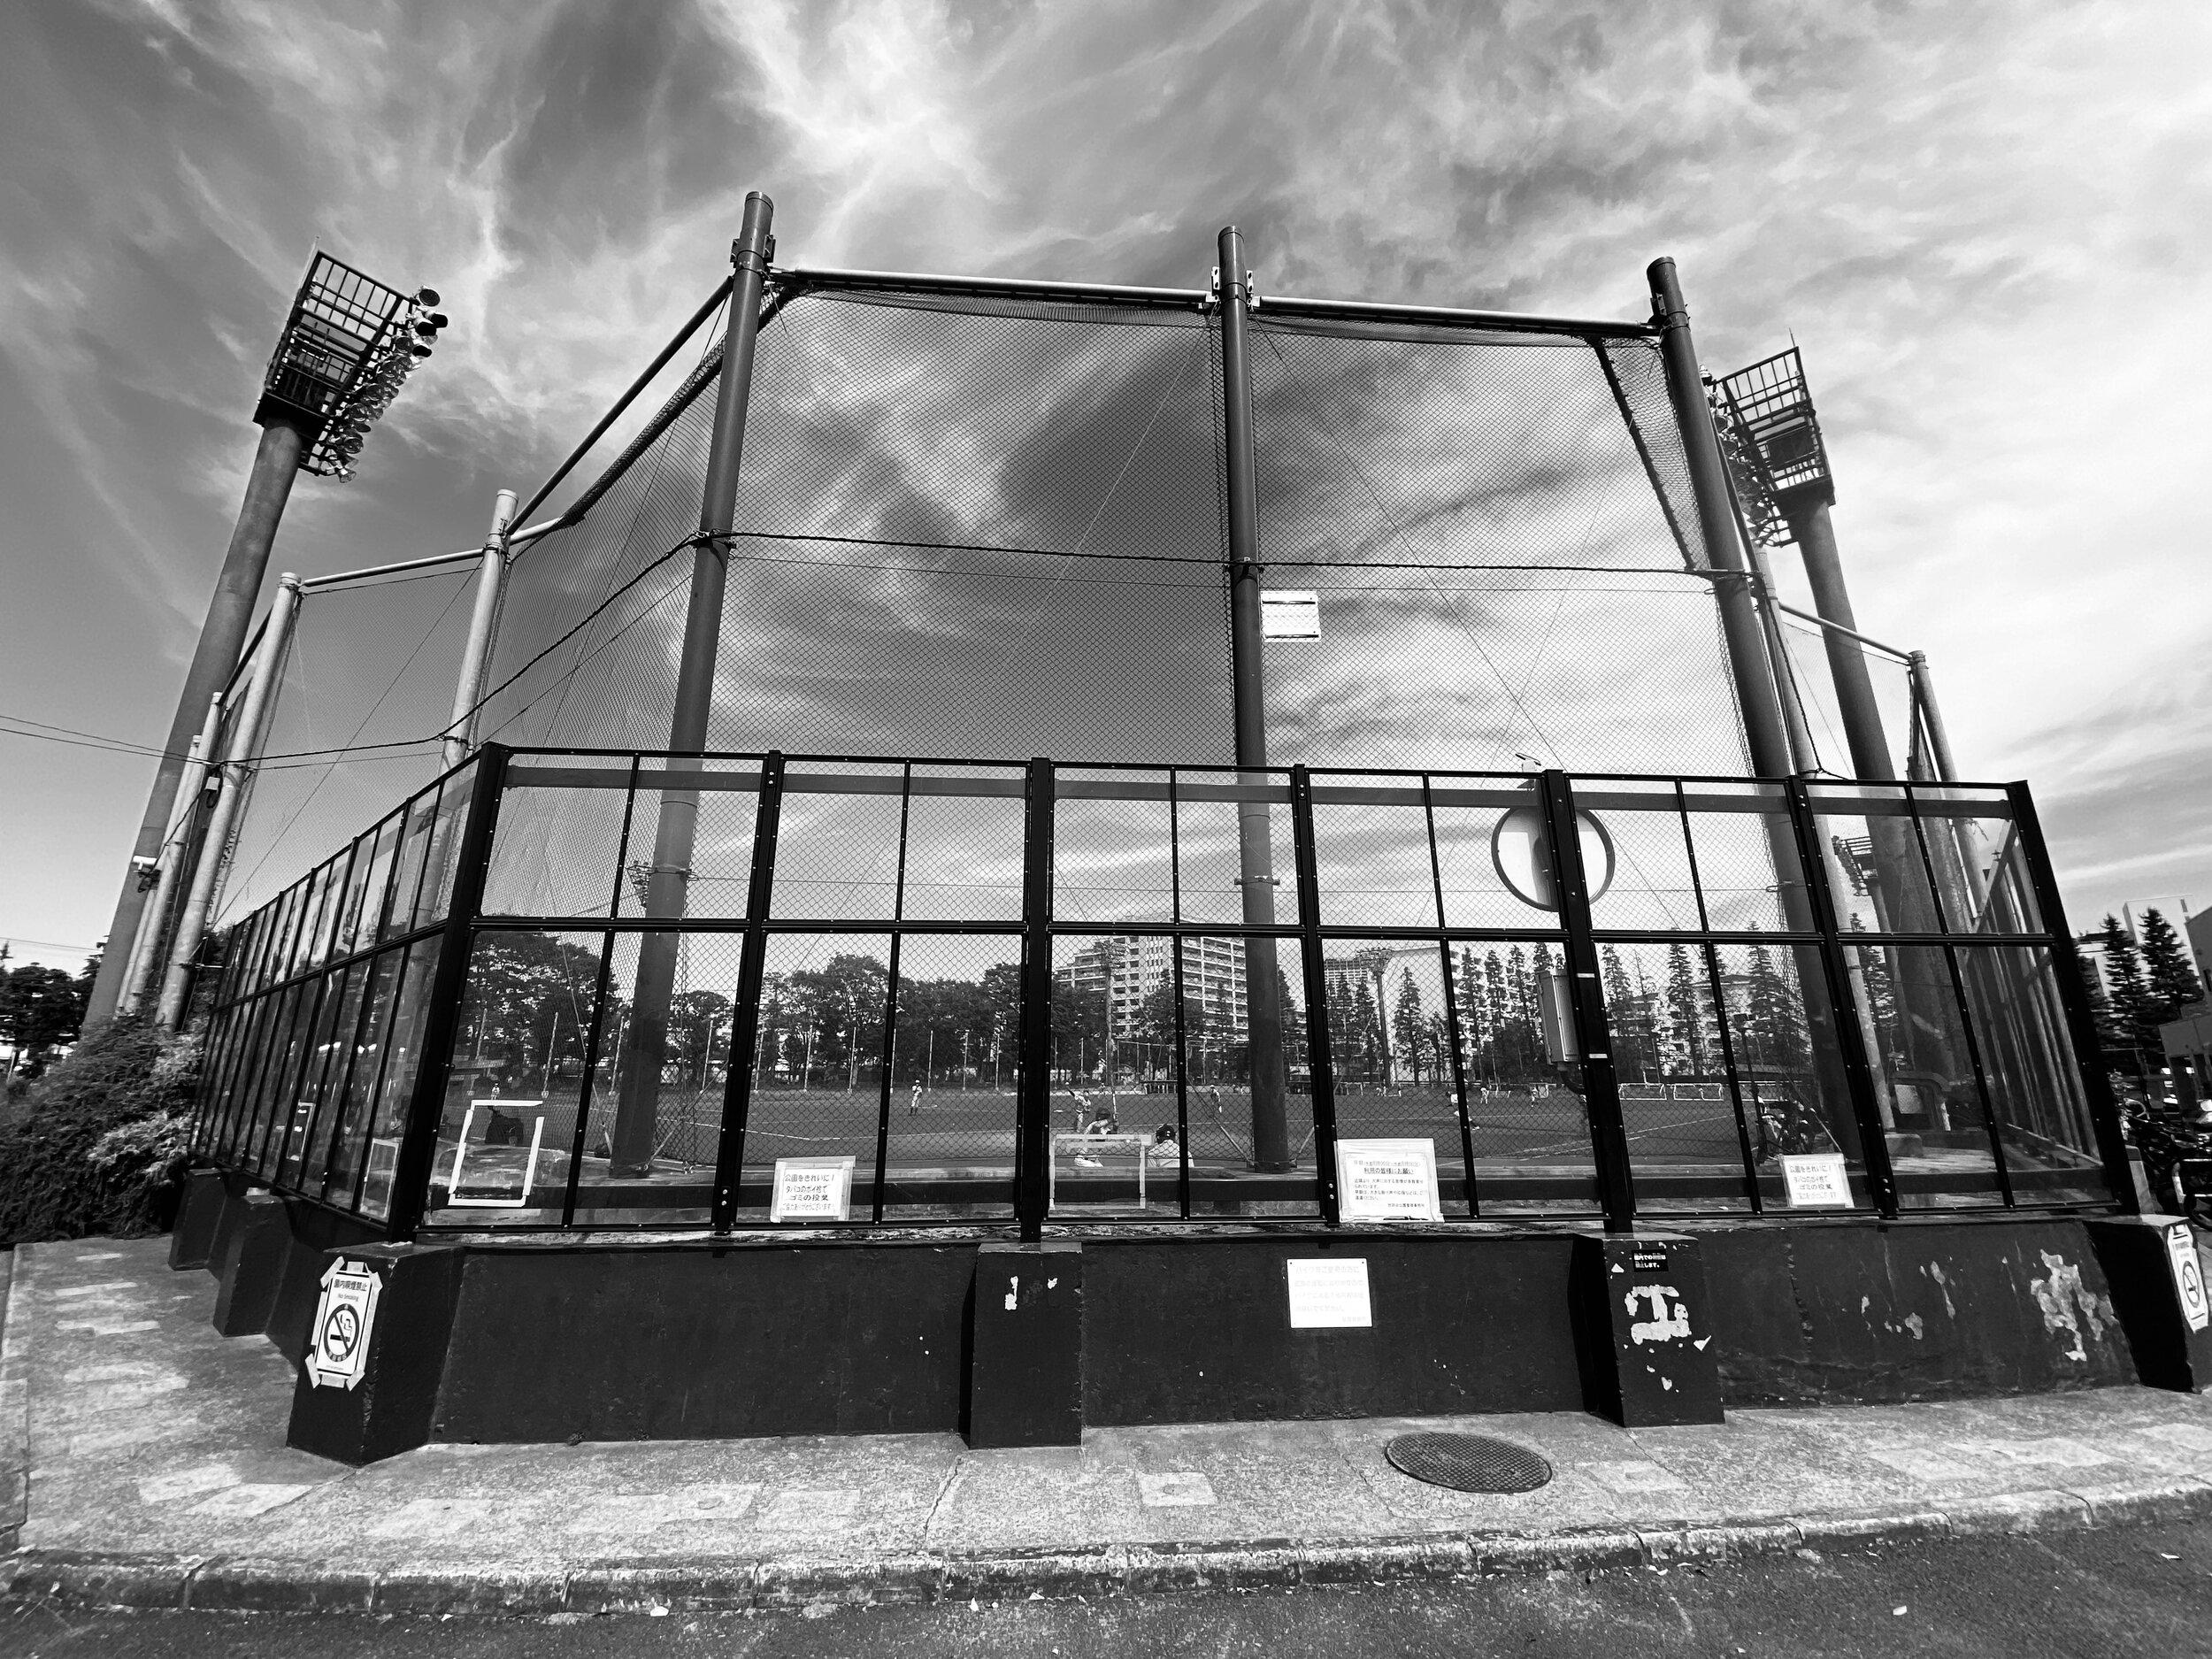 setagaya park baseball backstop